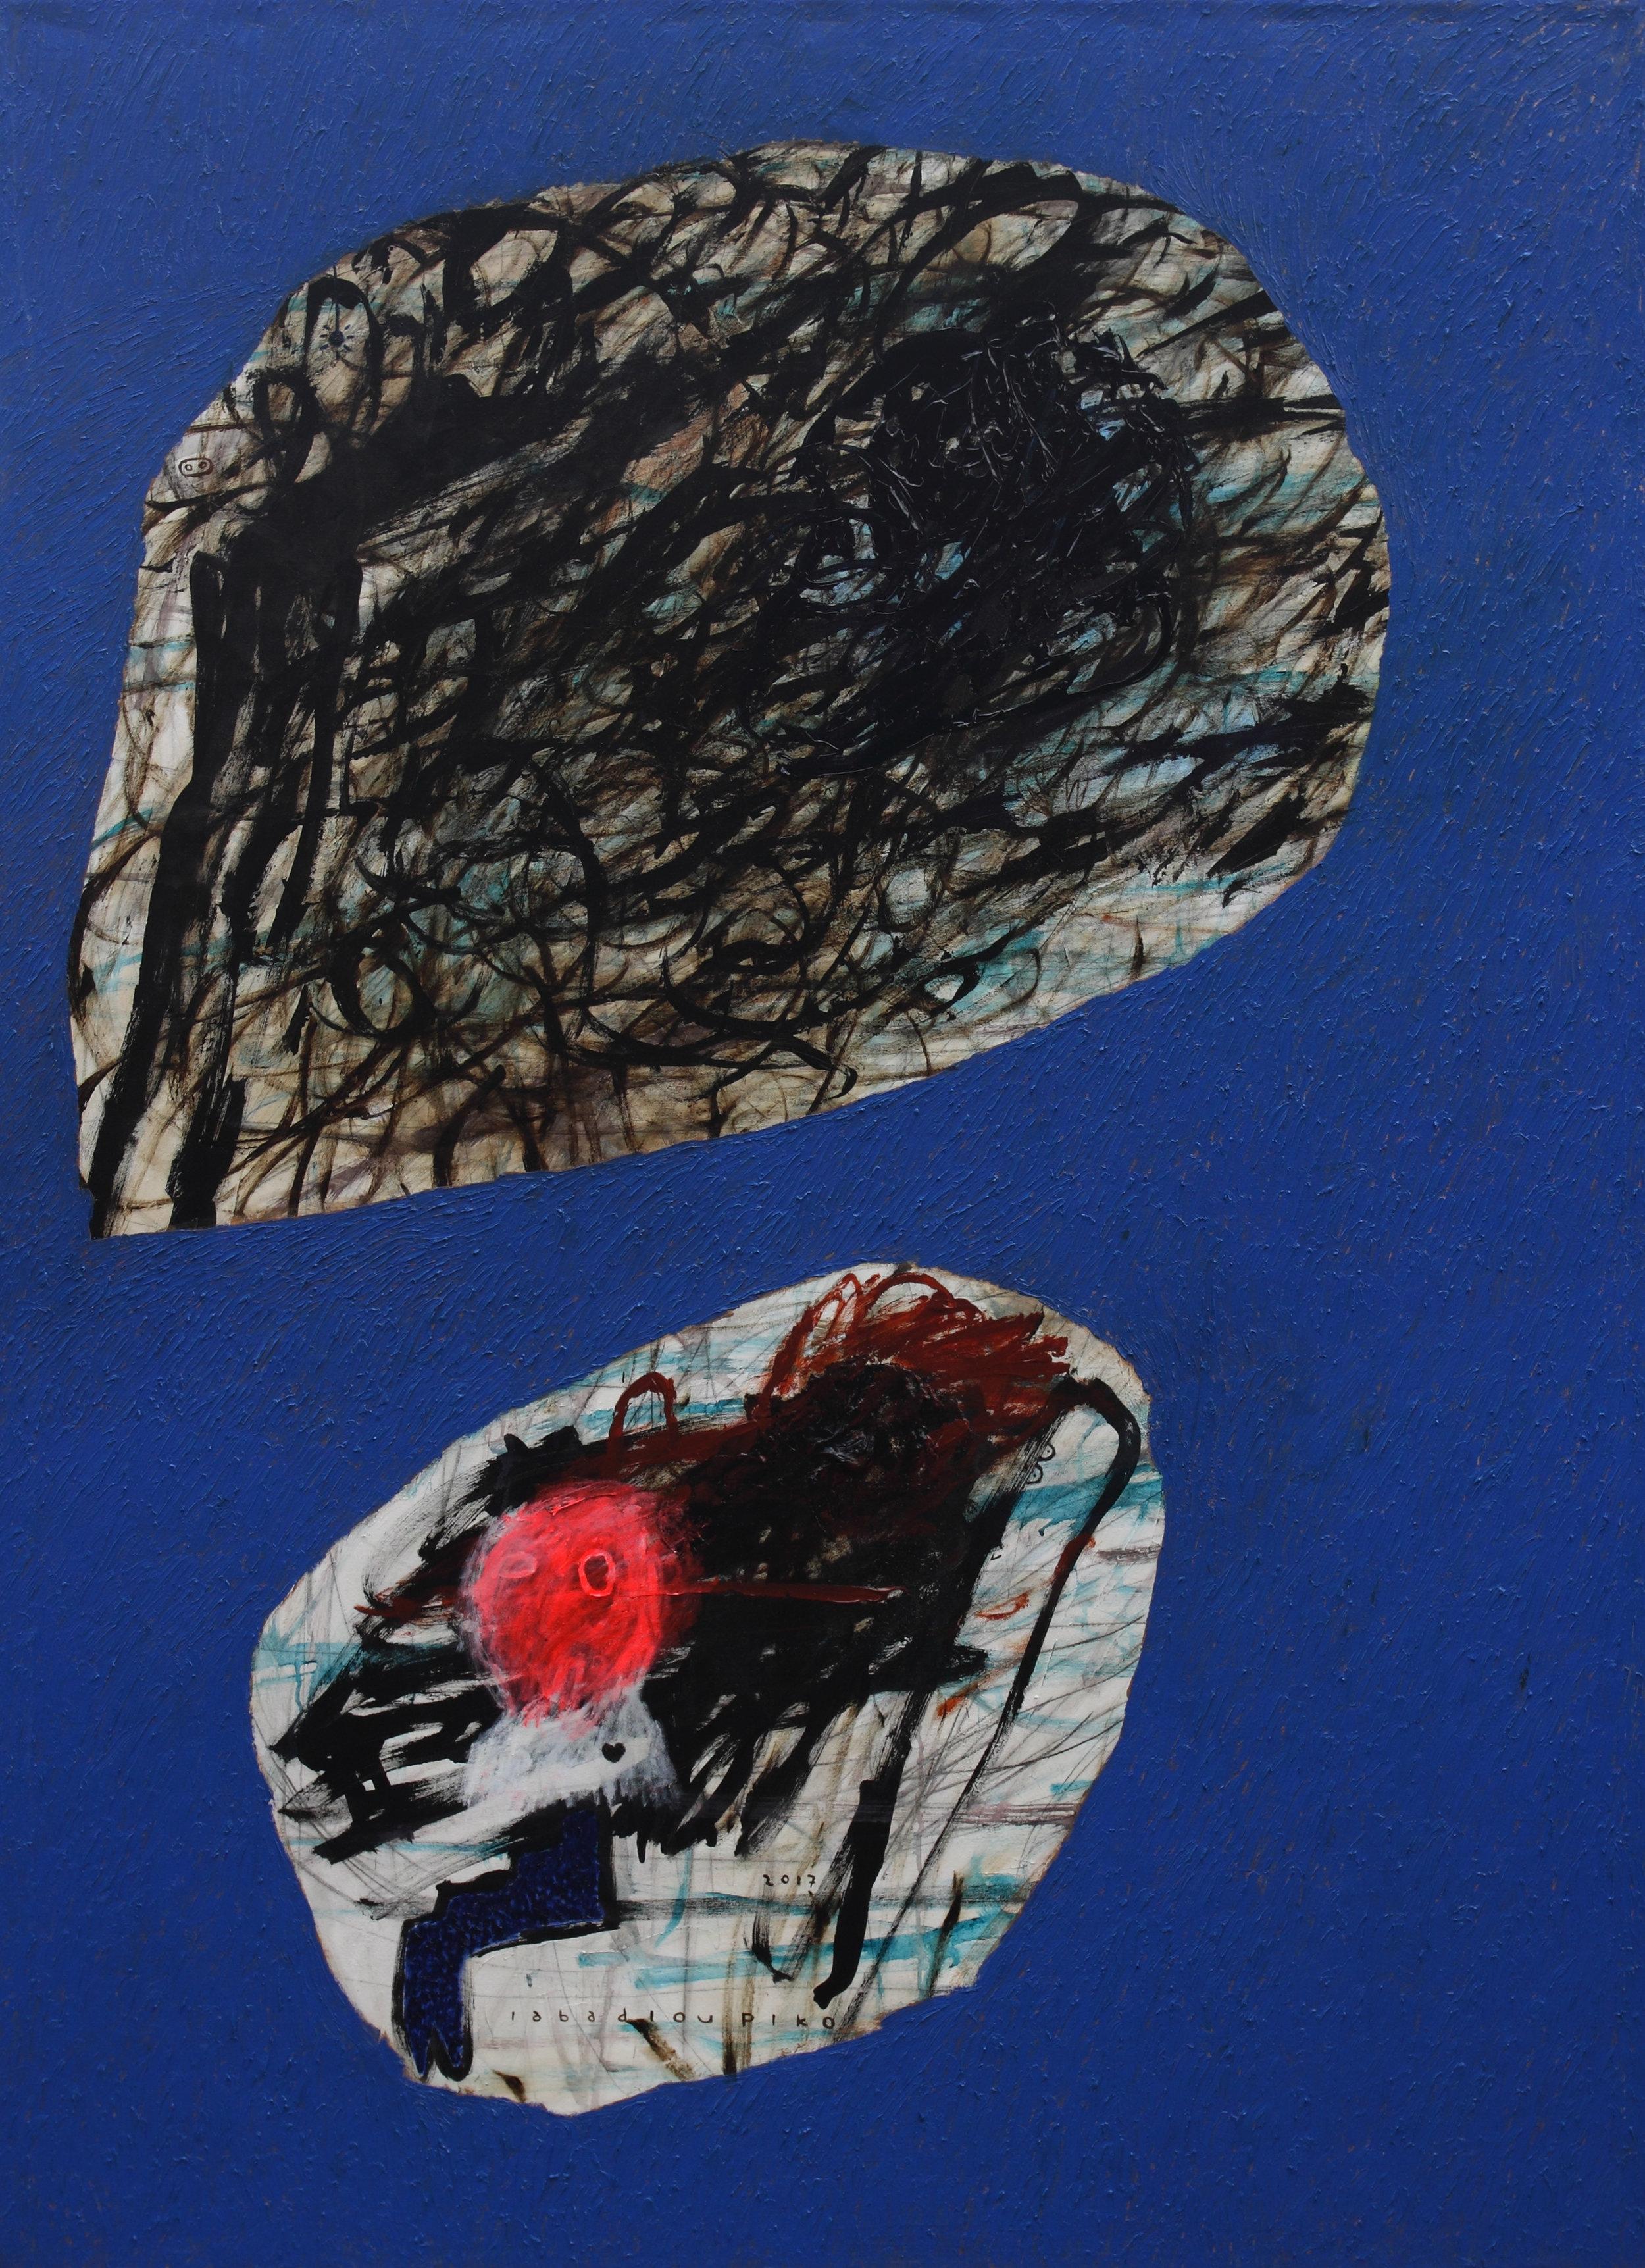 Iabadiou Piko, b.1984 (INDONESIA)  Title: Yang Nyata Di Belakangku, Di Depanku Masih Bayang-Bayang, Berisik Di Sekeliling Biru  Medium: Acrylic, Bitumen, Oil, Charcoal Pencil on Canvas  Dimension: 200 x 145 cm  Year: 2017